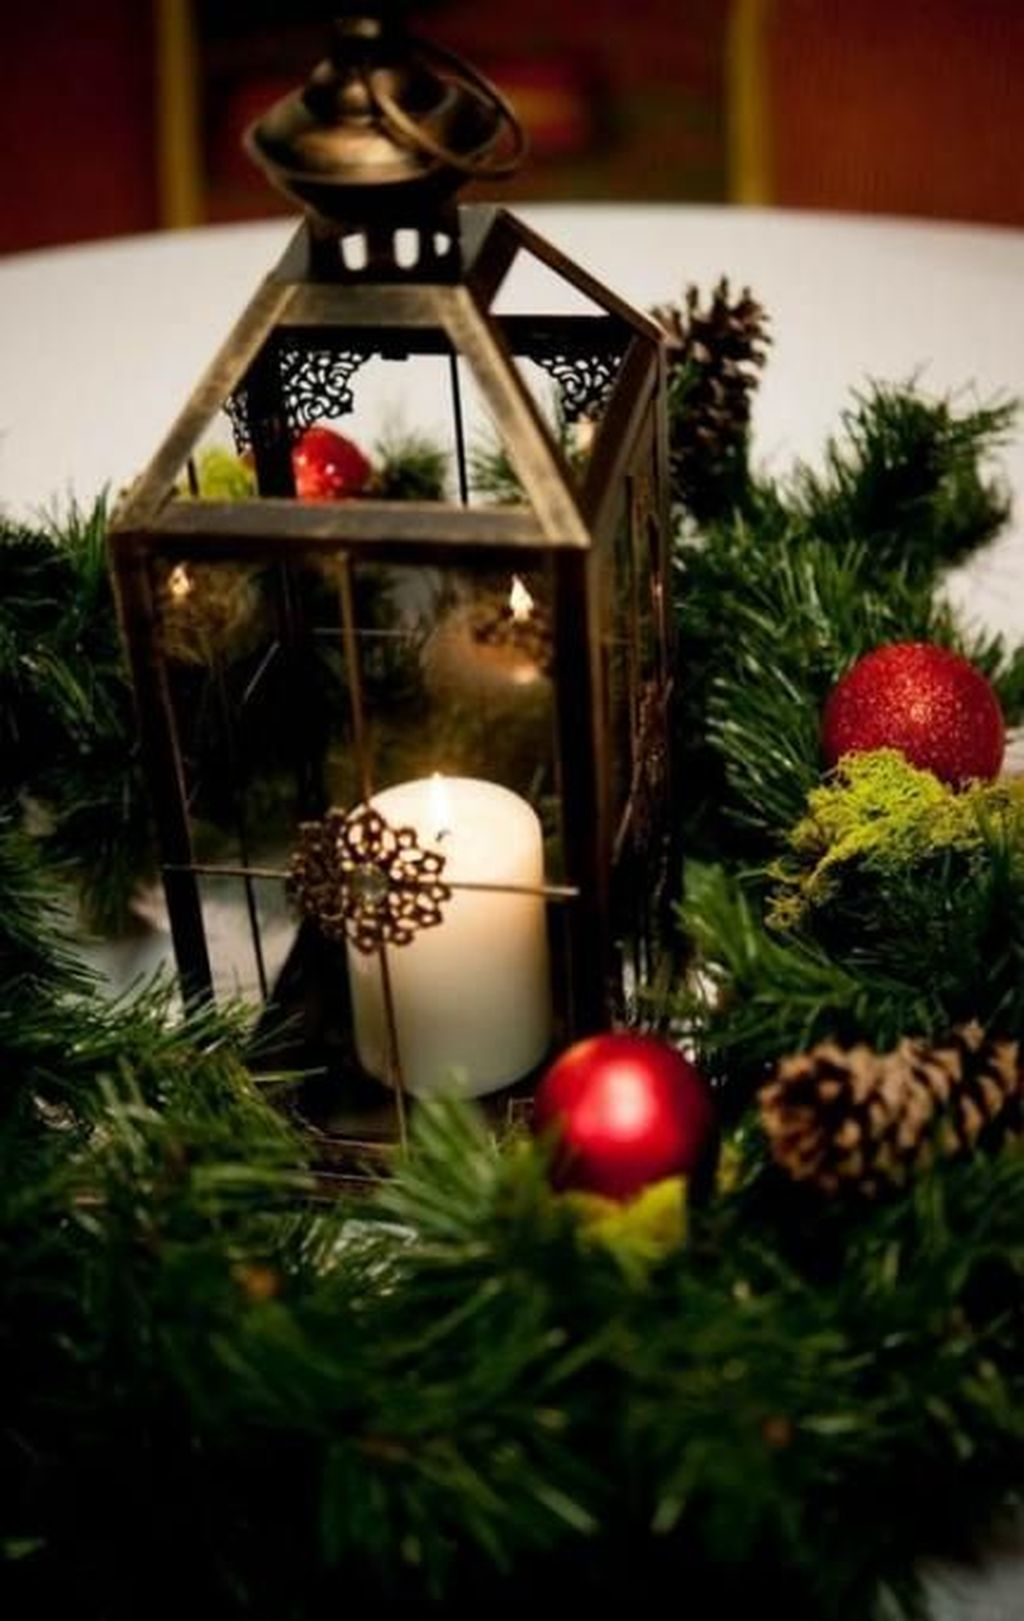 Fabulous Winter Lantern Centerpieces Ideas 34 Pimphomee